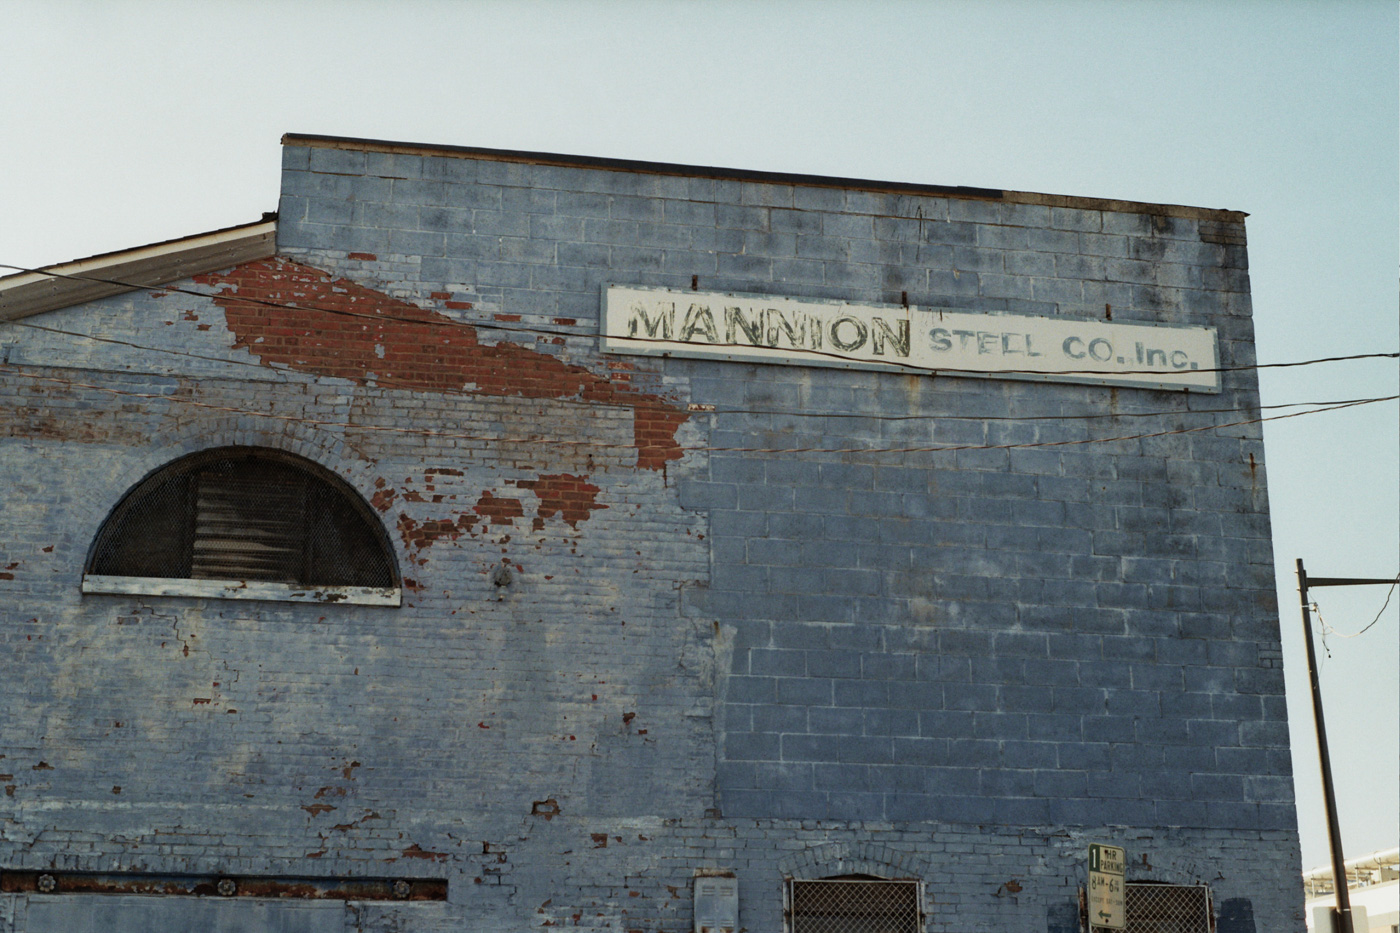 Mannion Steel Co. Inc.